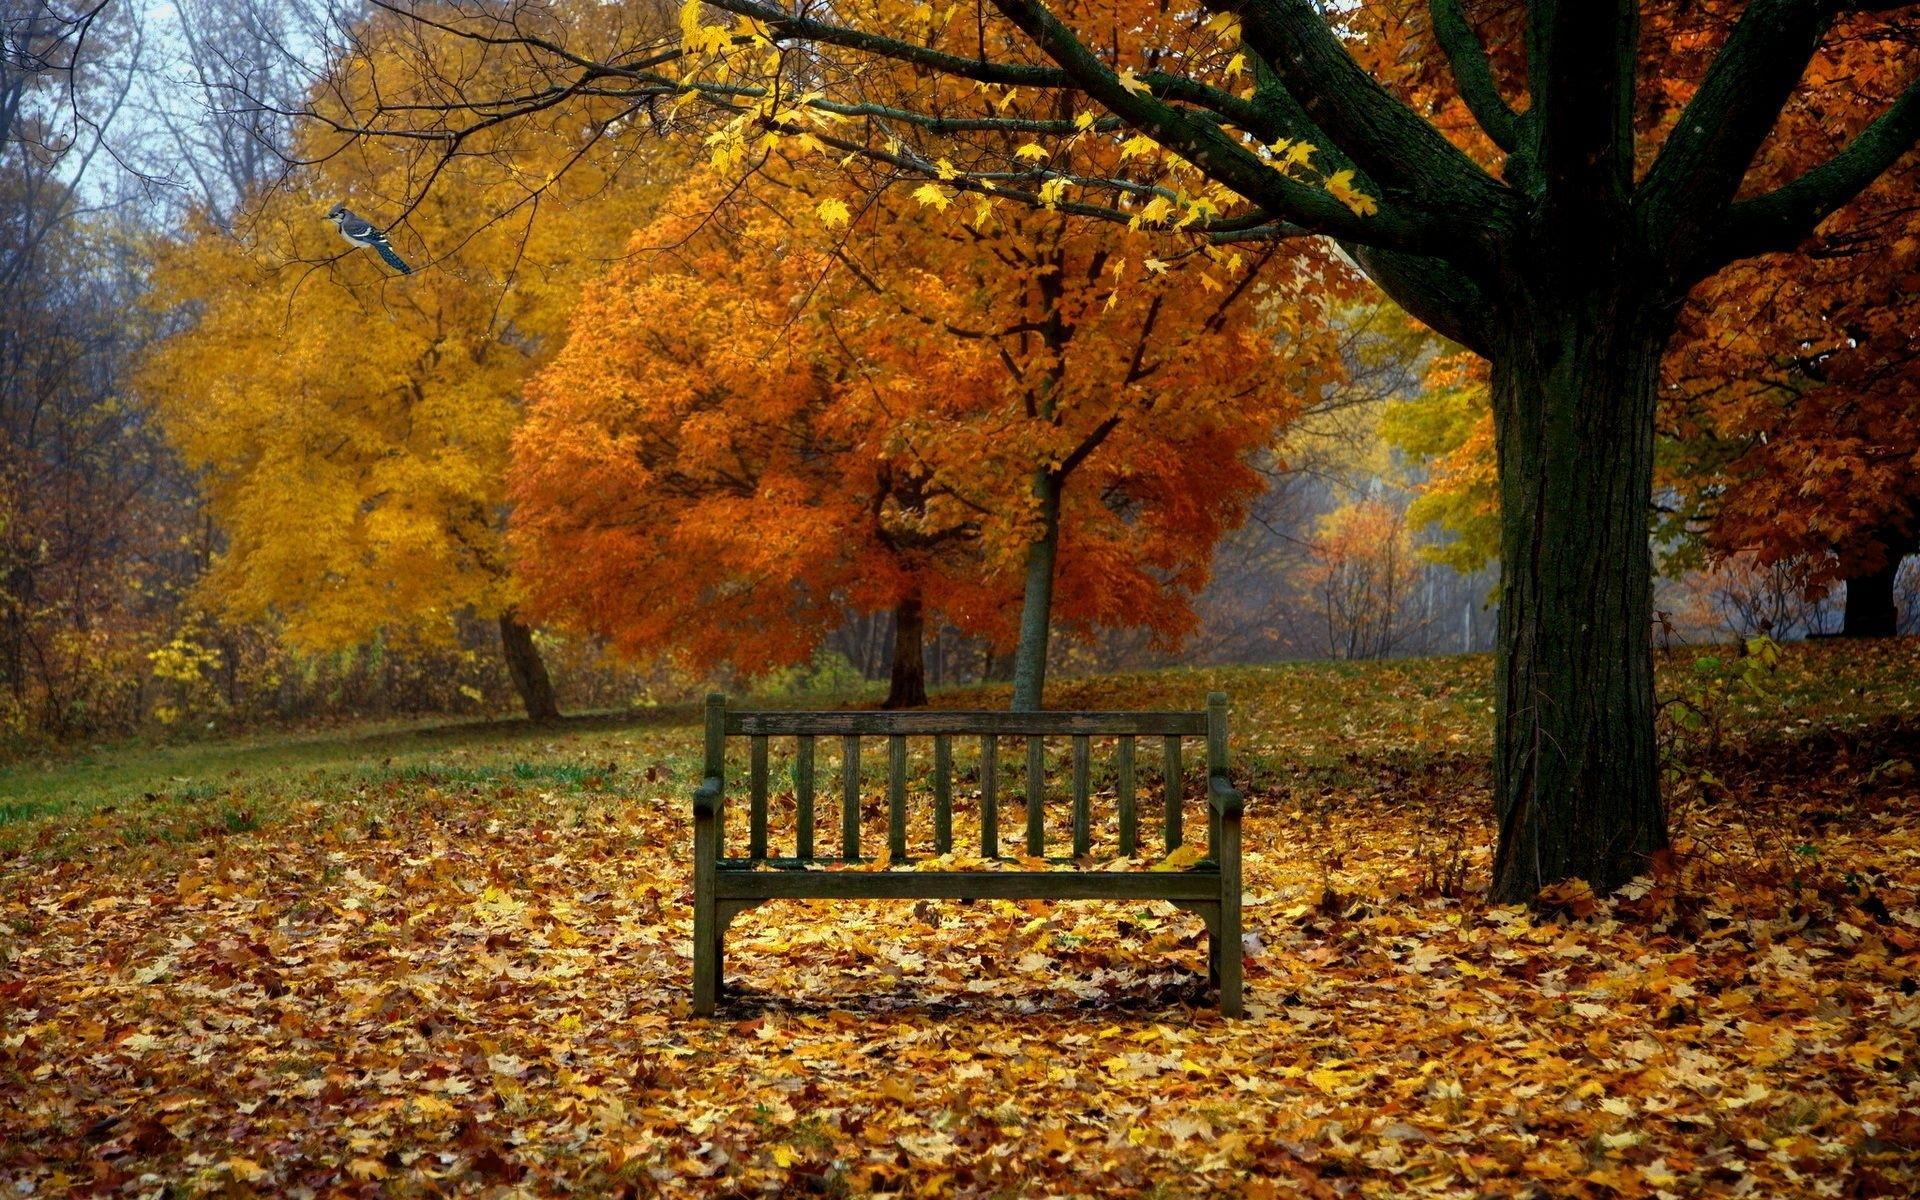 fall scenes for desktop background | season wallpaper | pinterest